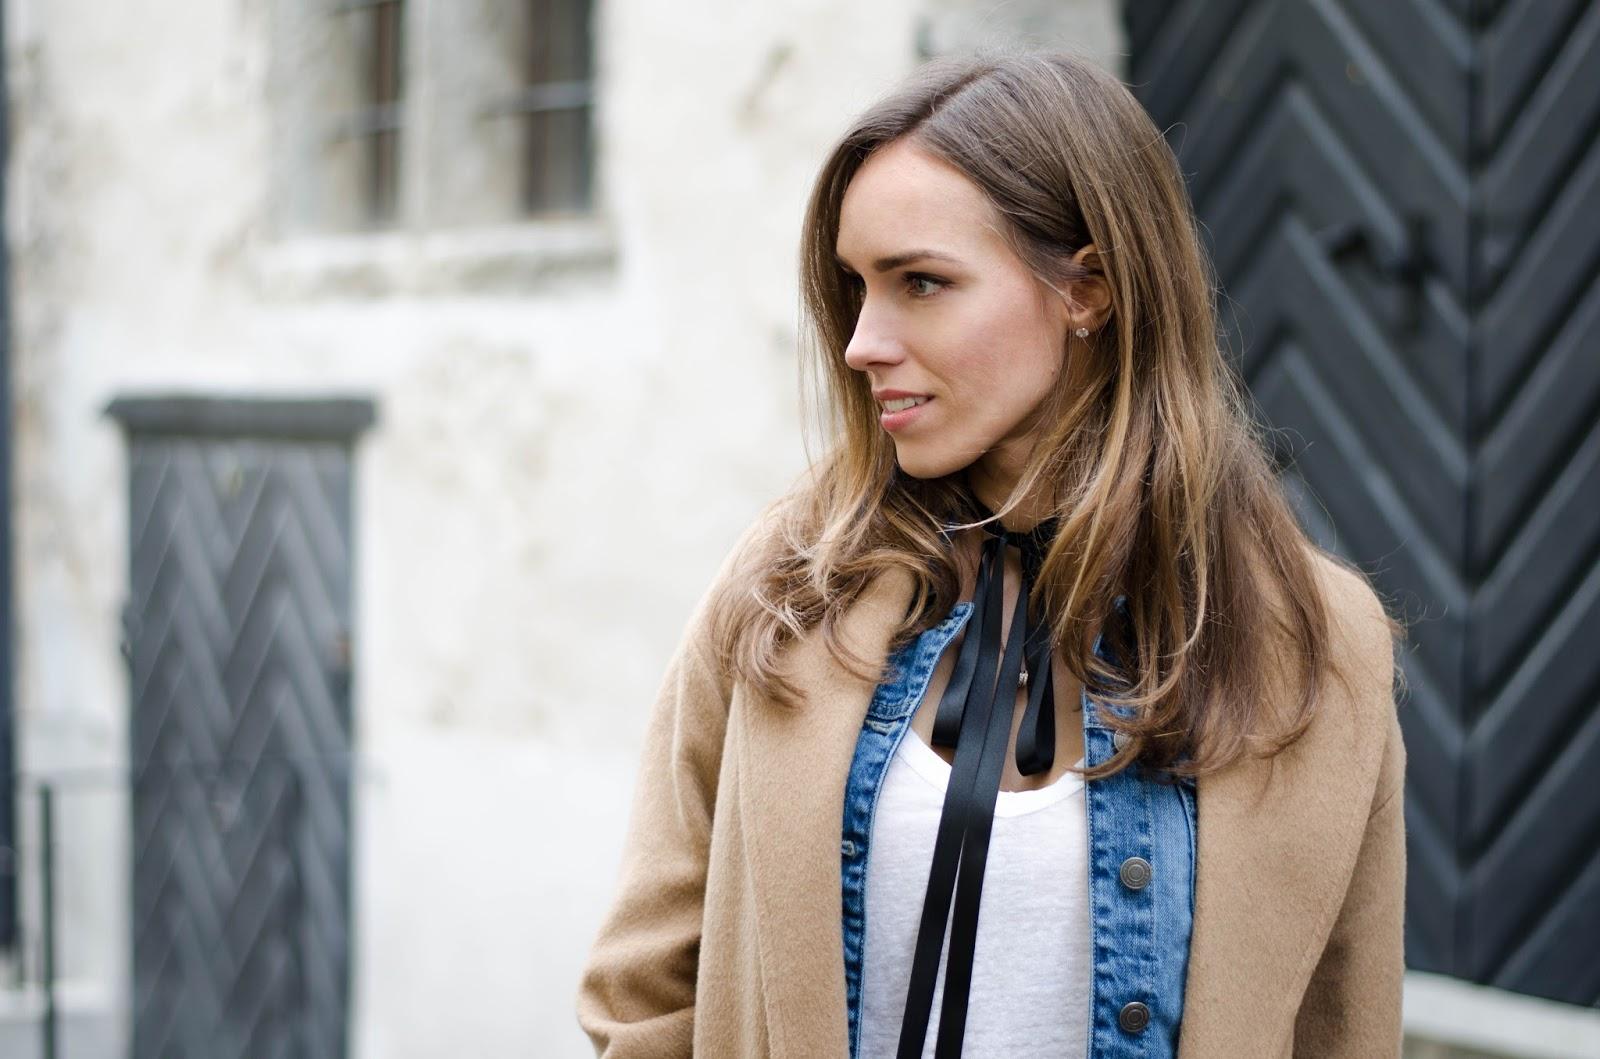 kristjaana mere black ribbon bow neck tie minimalist outfit